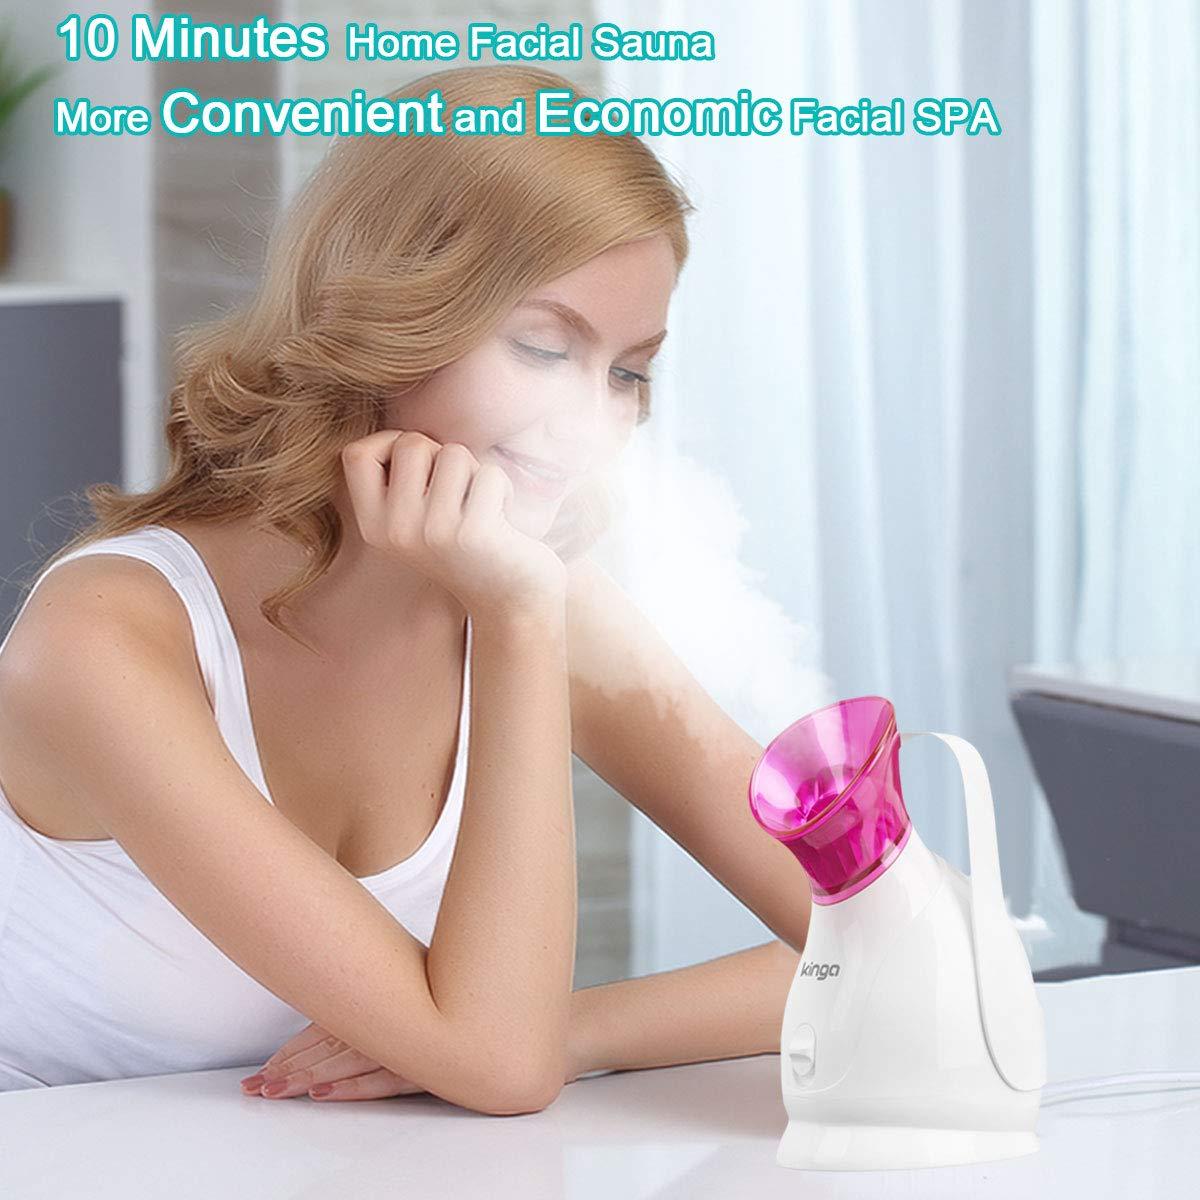 Facial Steamer Face Steamer KINGA Hot Mist Skin Moisturizing Opening Skin Pores Removing Blackhead Home SPA 5PCS Skin Care Kit: Beauty